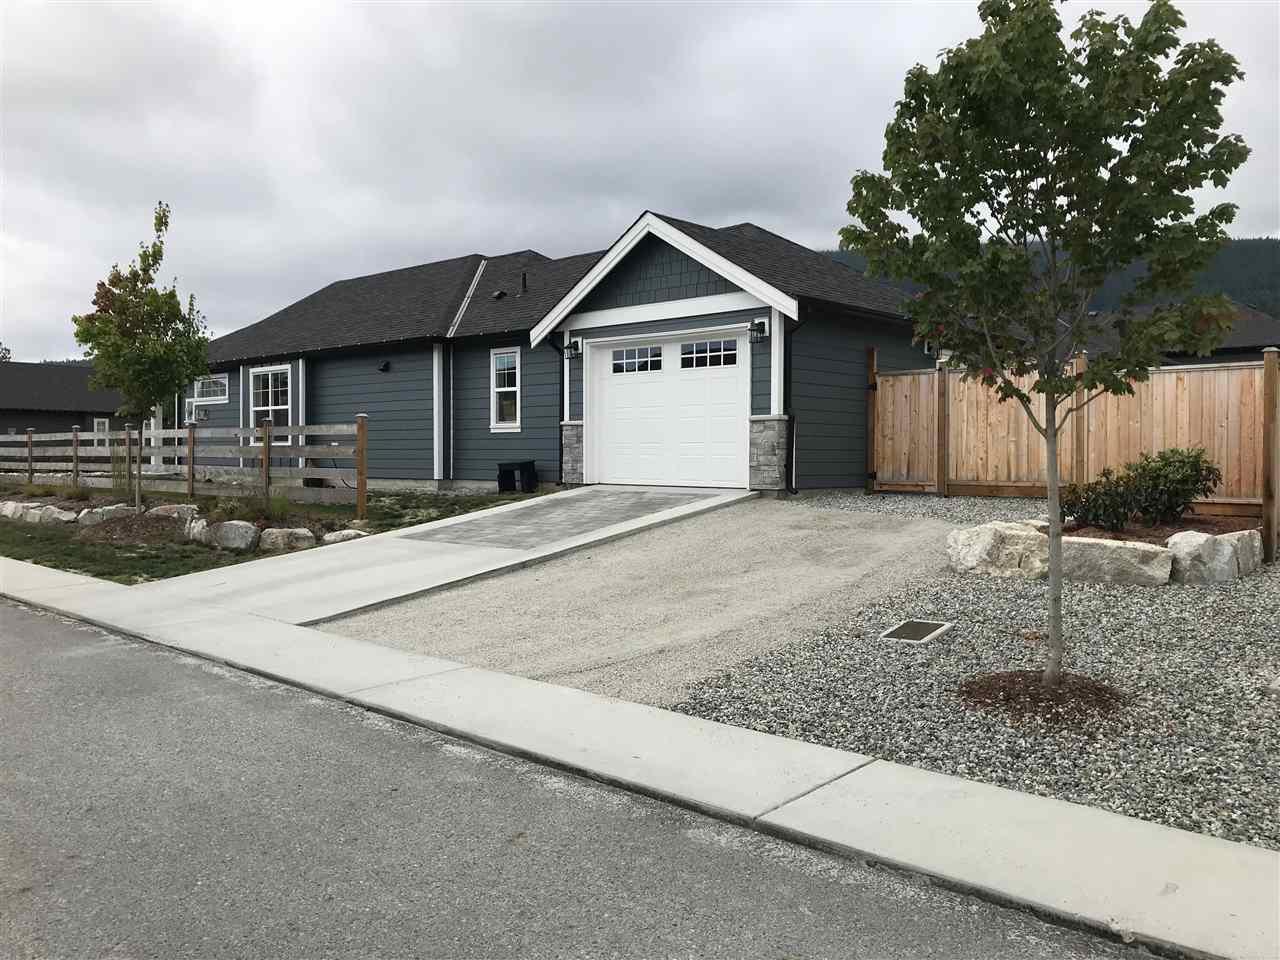 Goddard Road - House Front